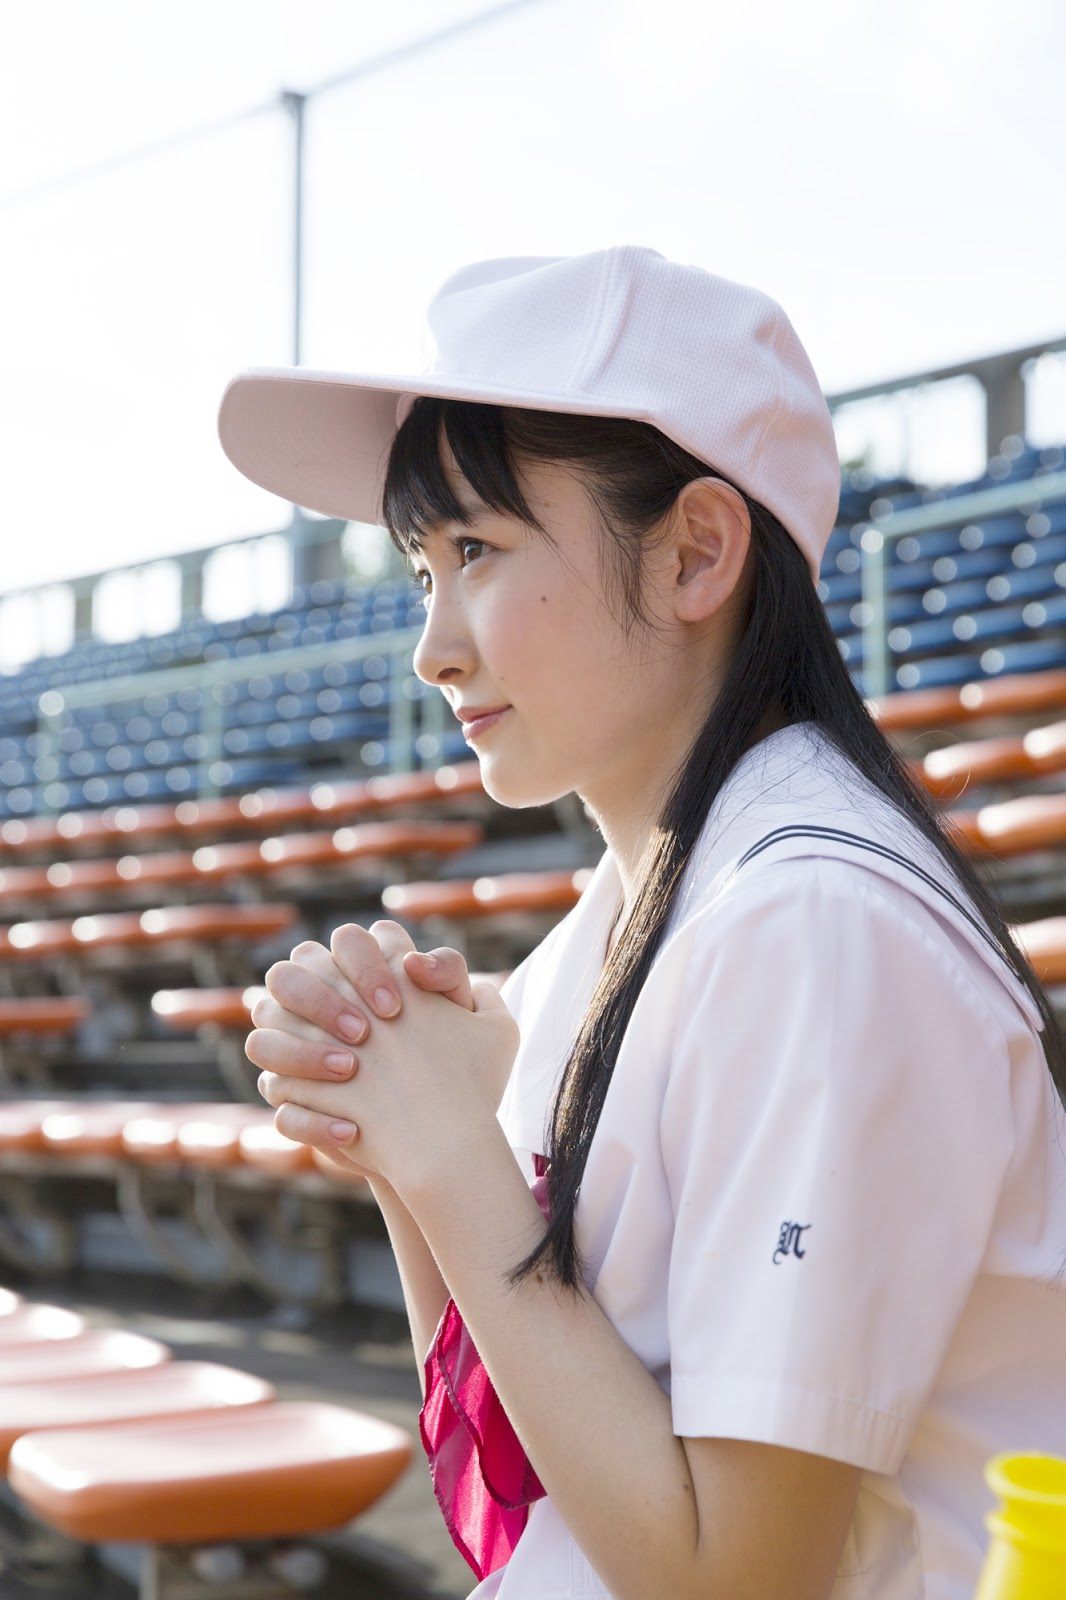 Chisaki Morito - Hello! Project Digital Books Vol.164 - February 2018 - Japanese Gravure Idol